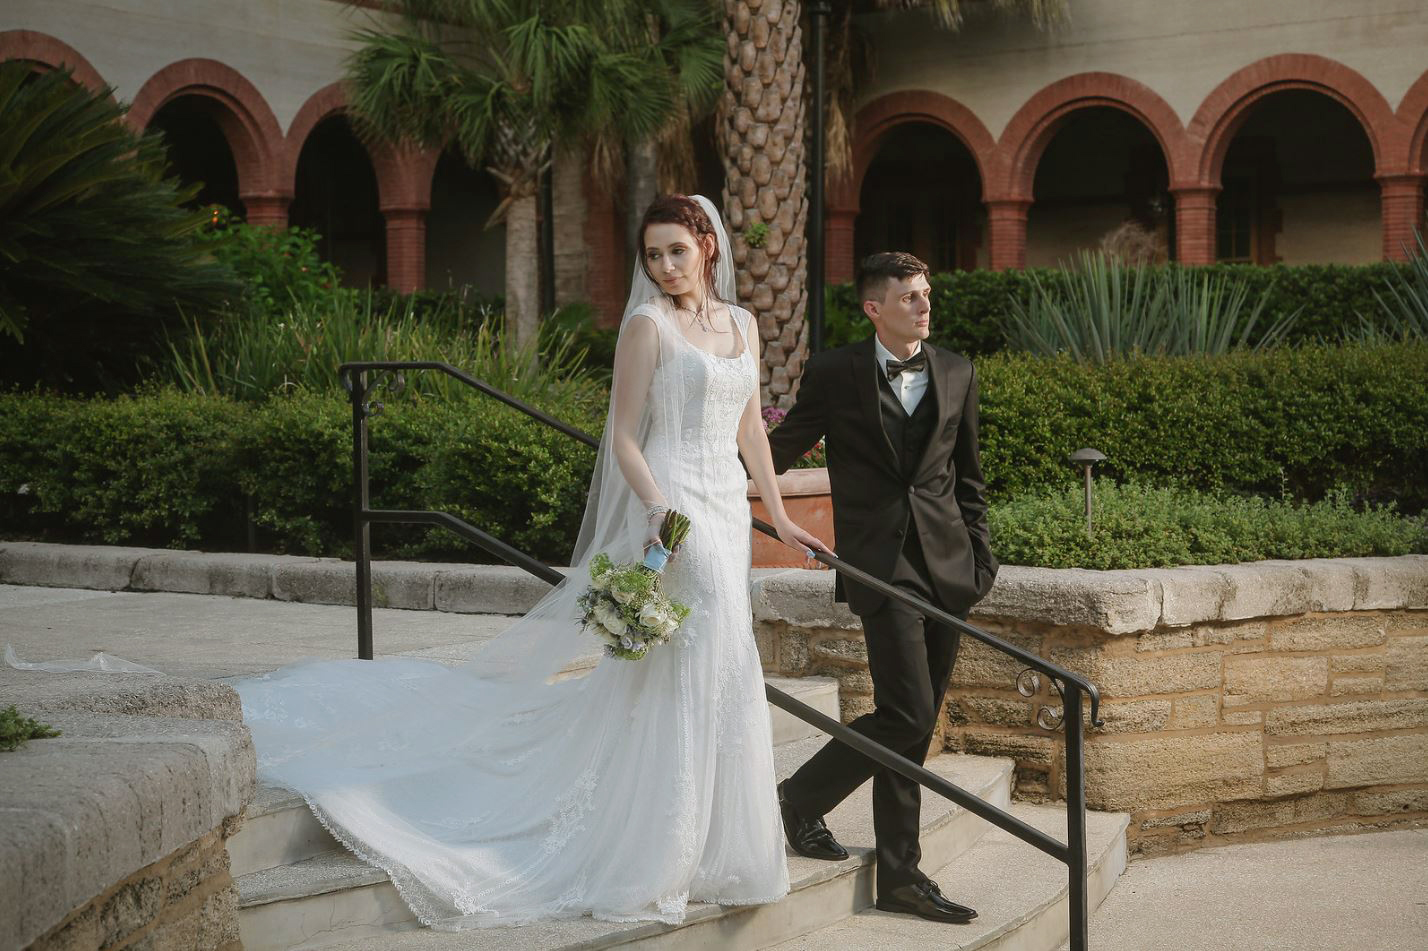 18-Treasury-onthe-plaza-SaintAugustine-wedding-photographer-jarstudio.JPG